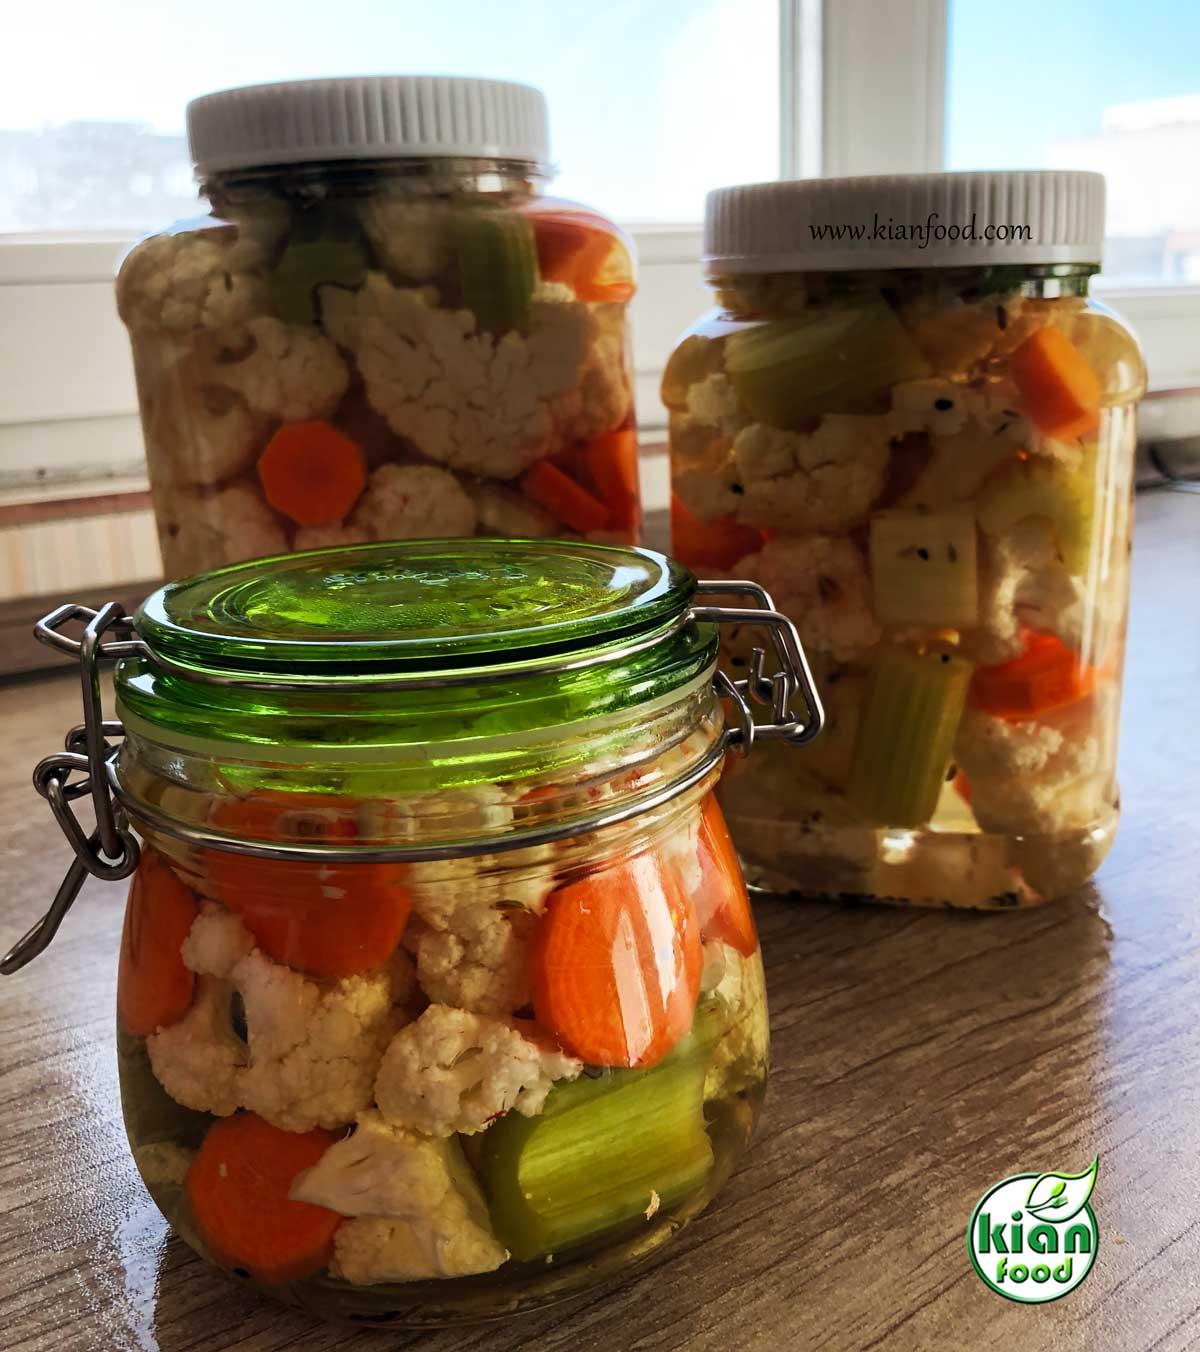 طرز تهیه شور گل کلم و هویج و کرفس